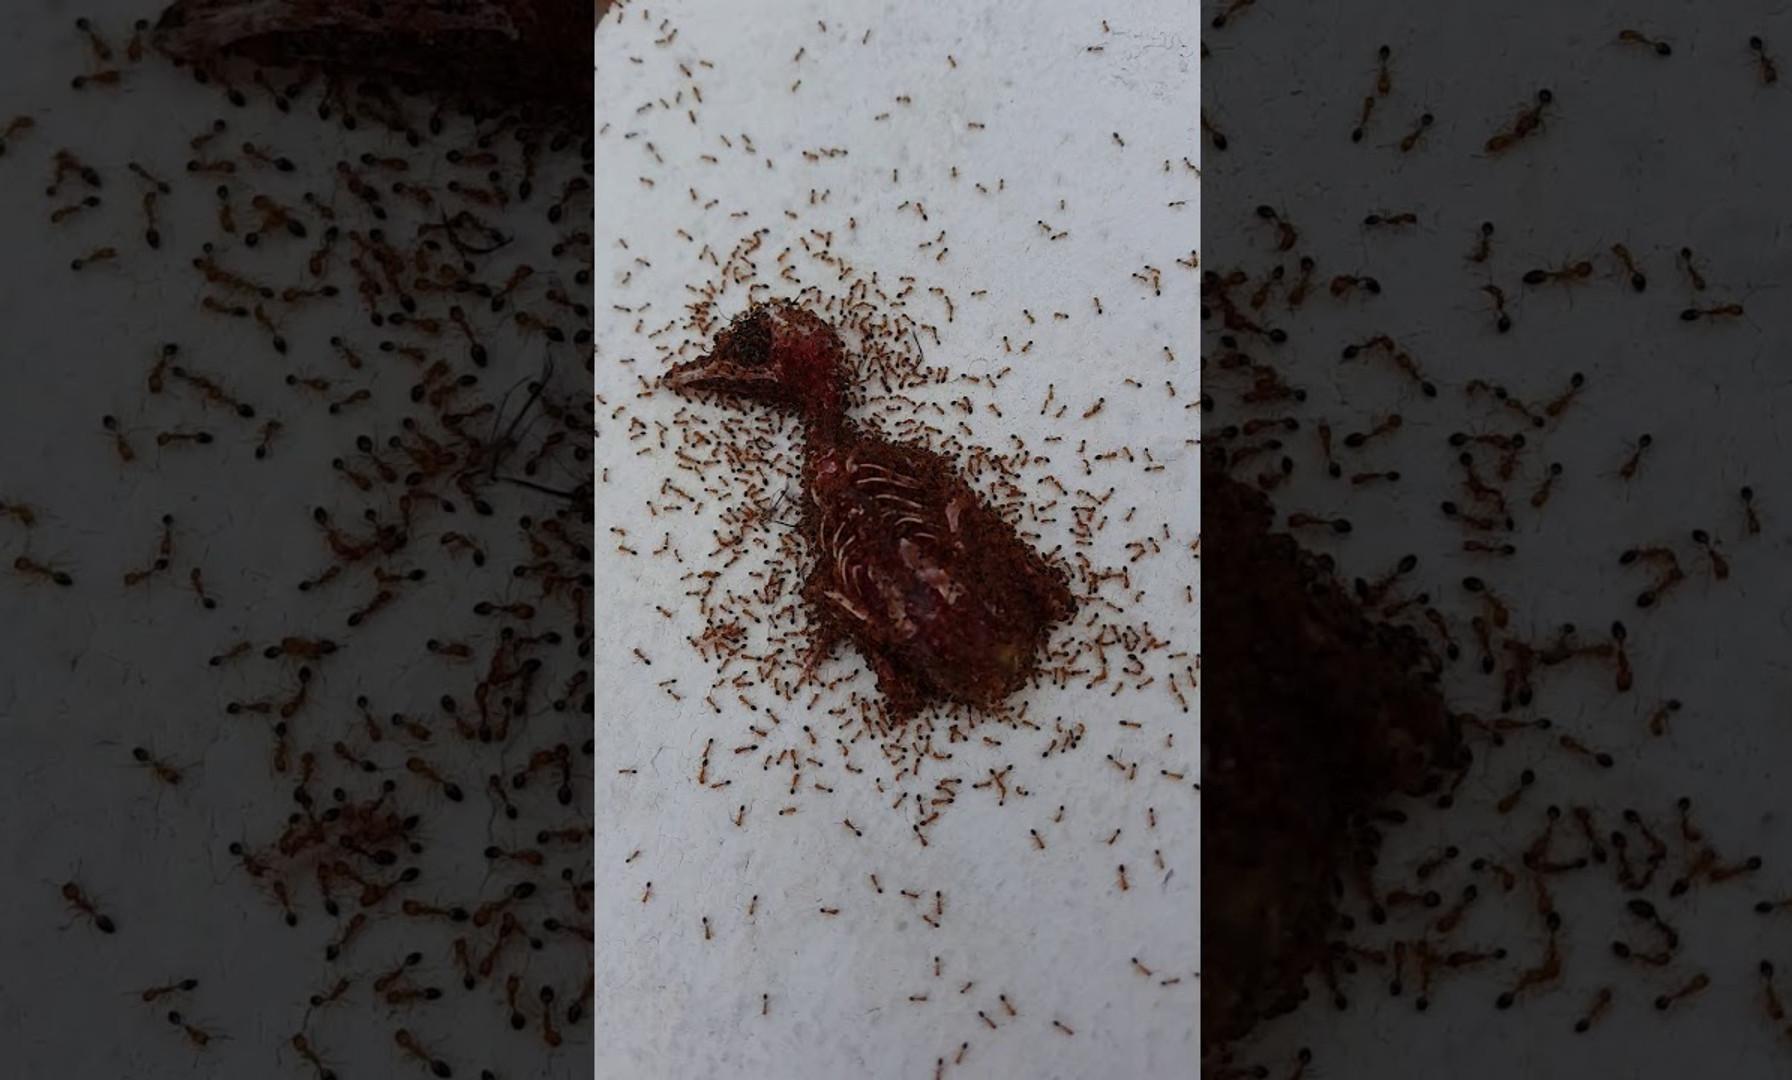 Ants Eating a Bird at the Old French Embassy; Panama City, Panama